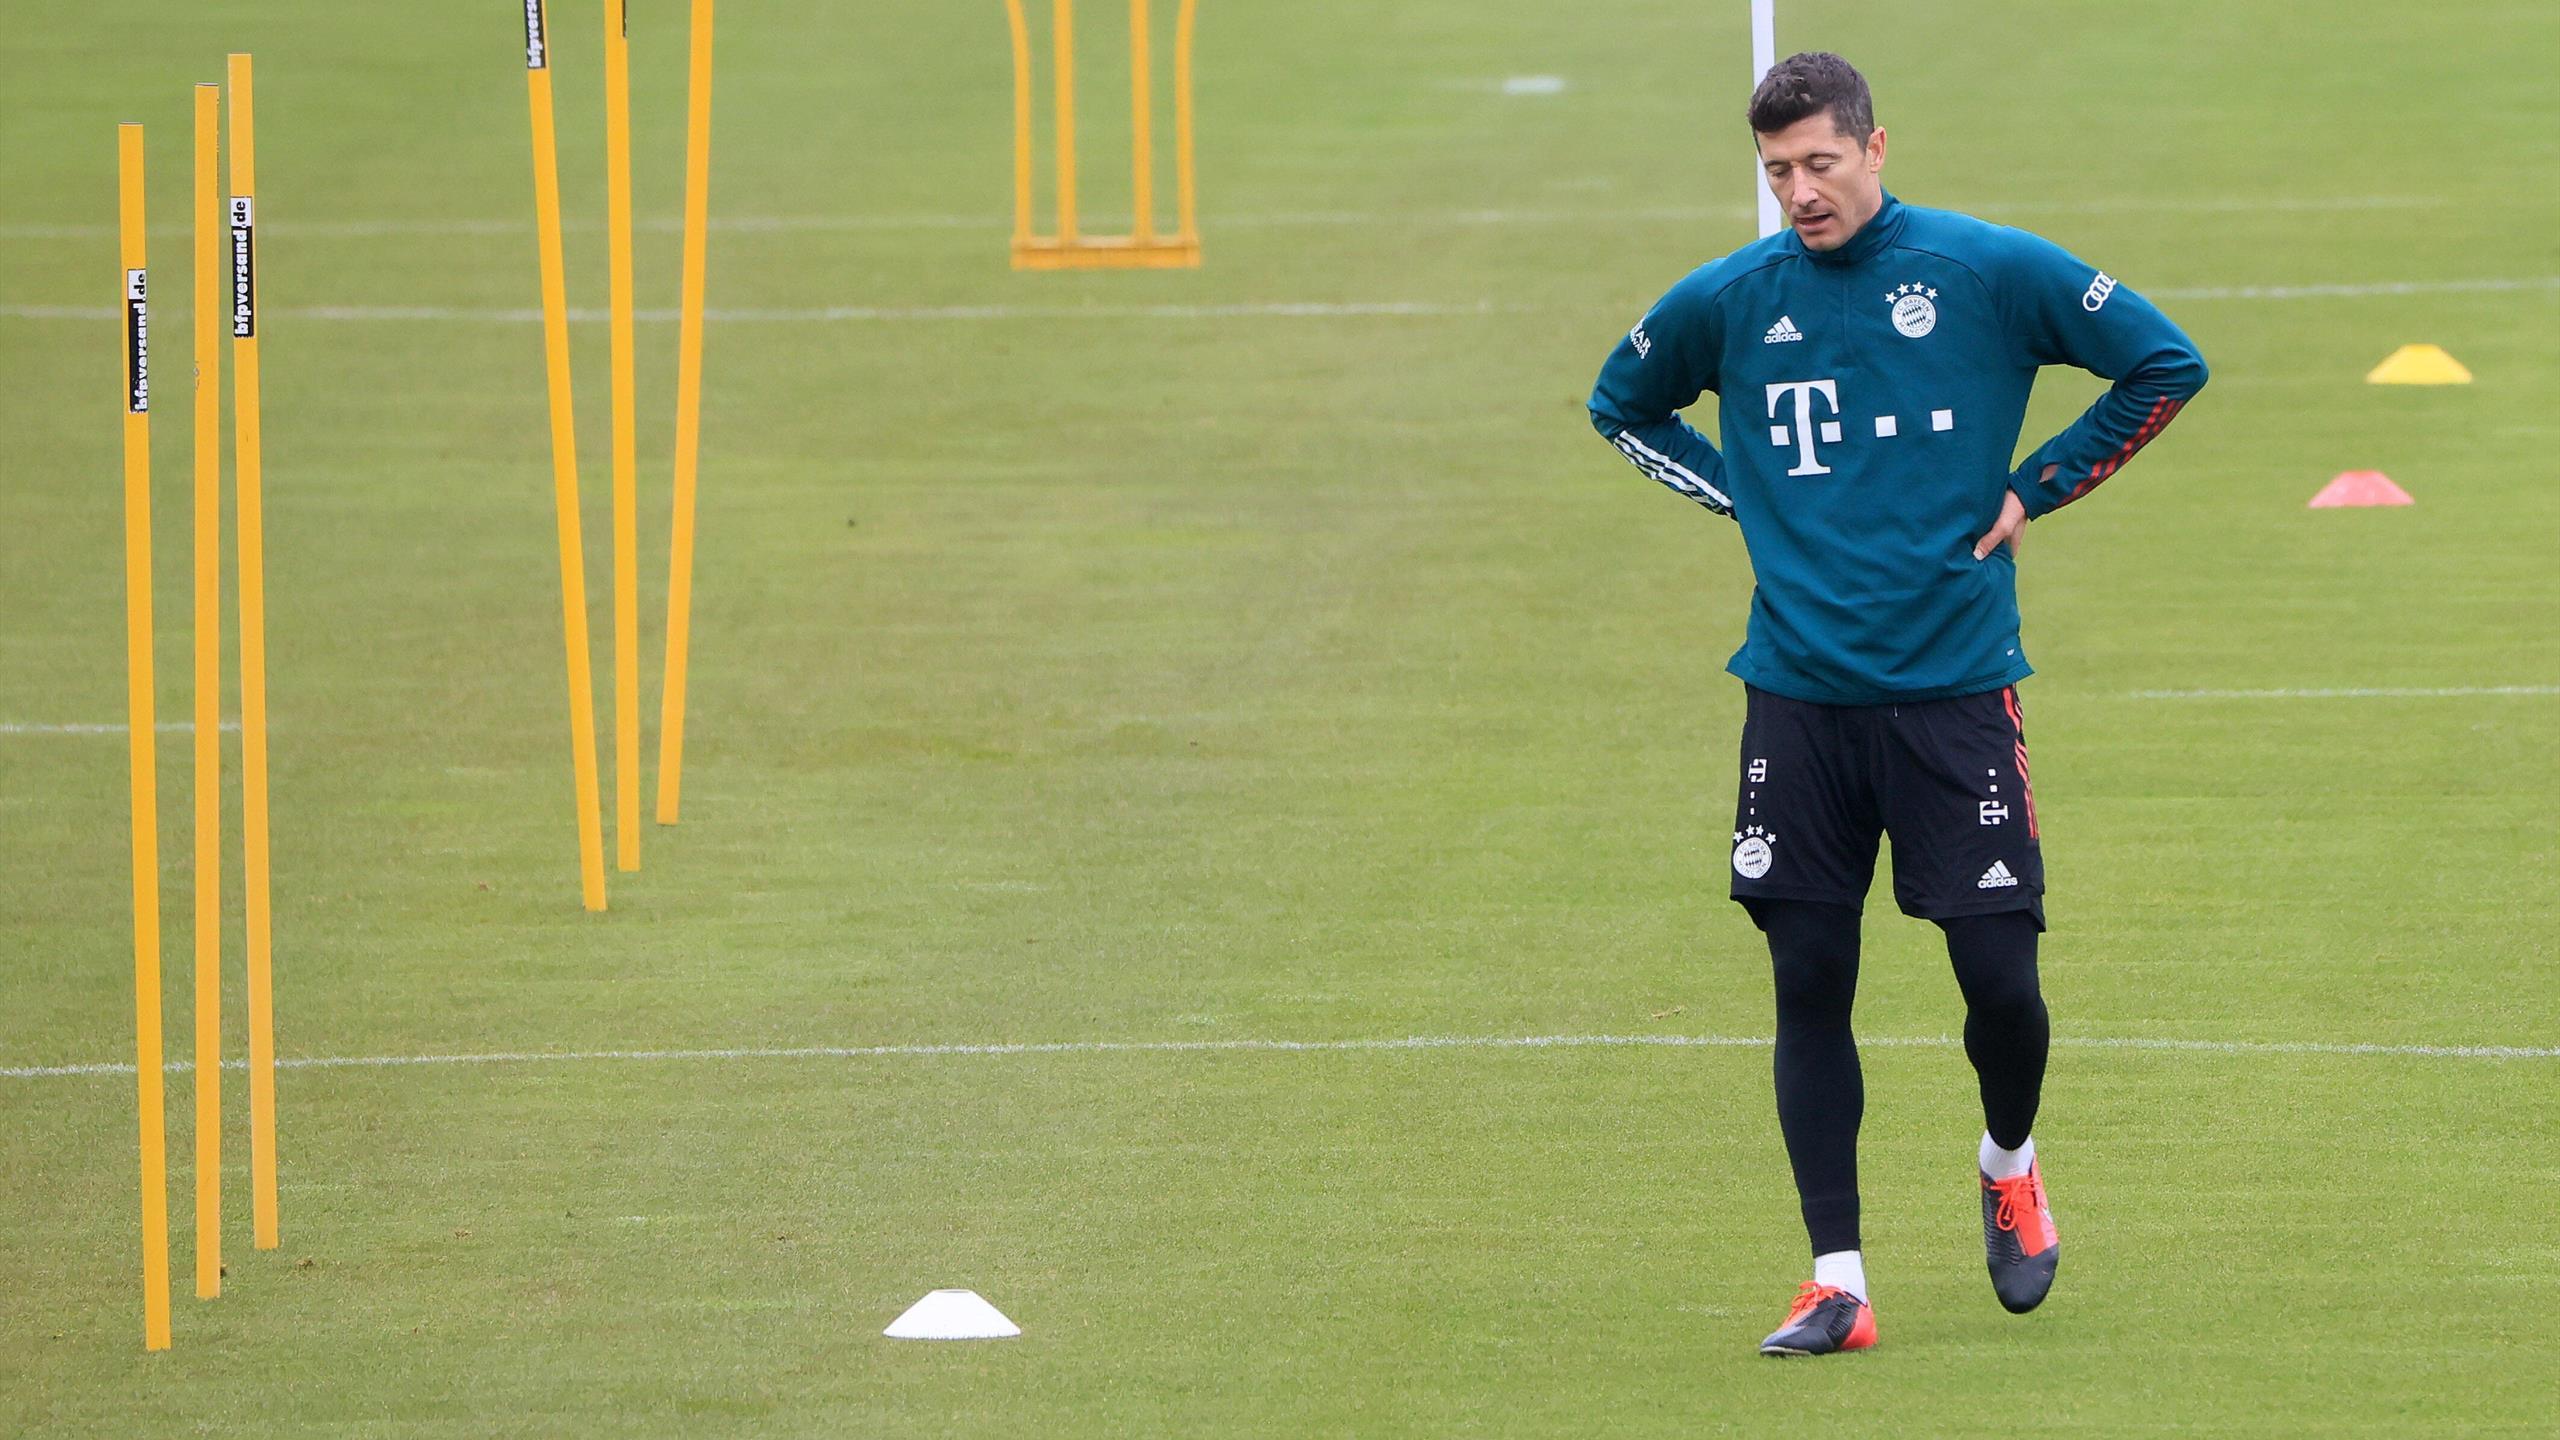 Lewandowski quitte précipitamment l'entraînement du Bayern Munich